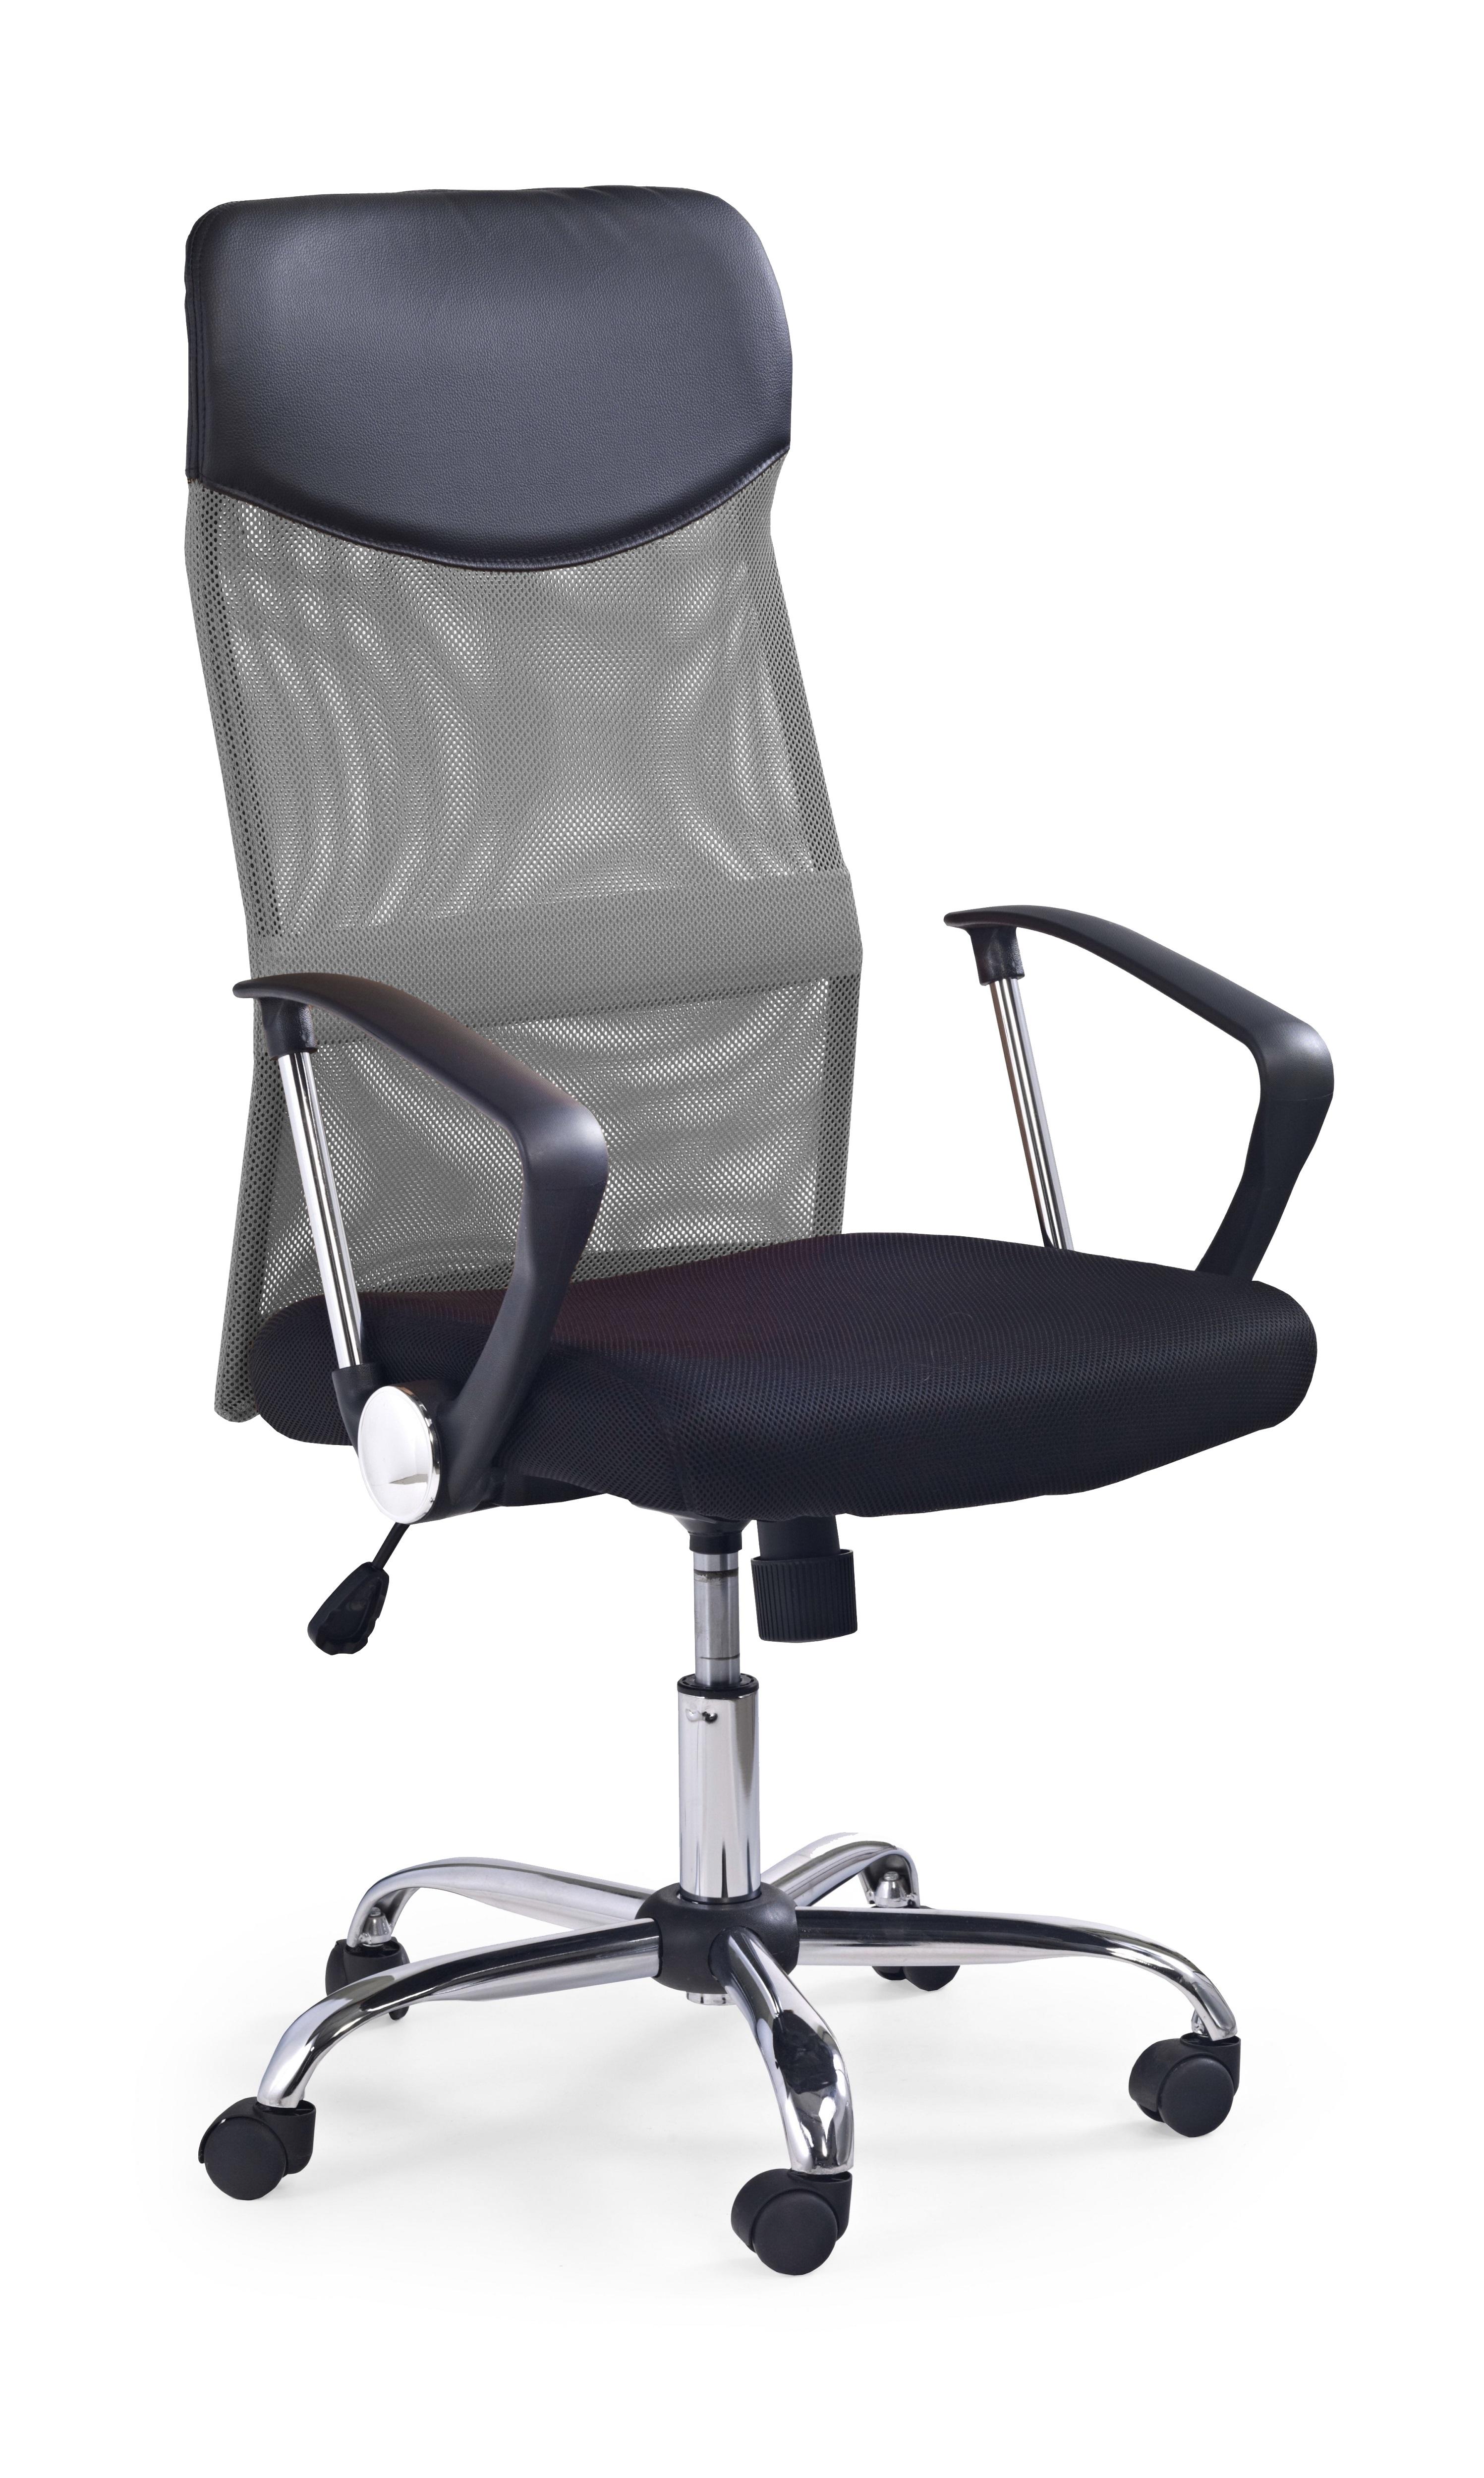 Scaun de birou ergonomic Vire Grey, l61xA63xH110-120 cm vivre.ro